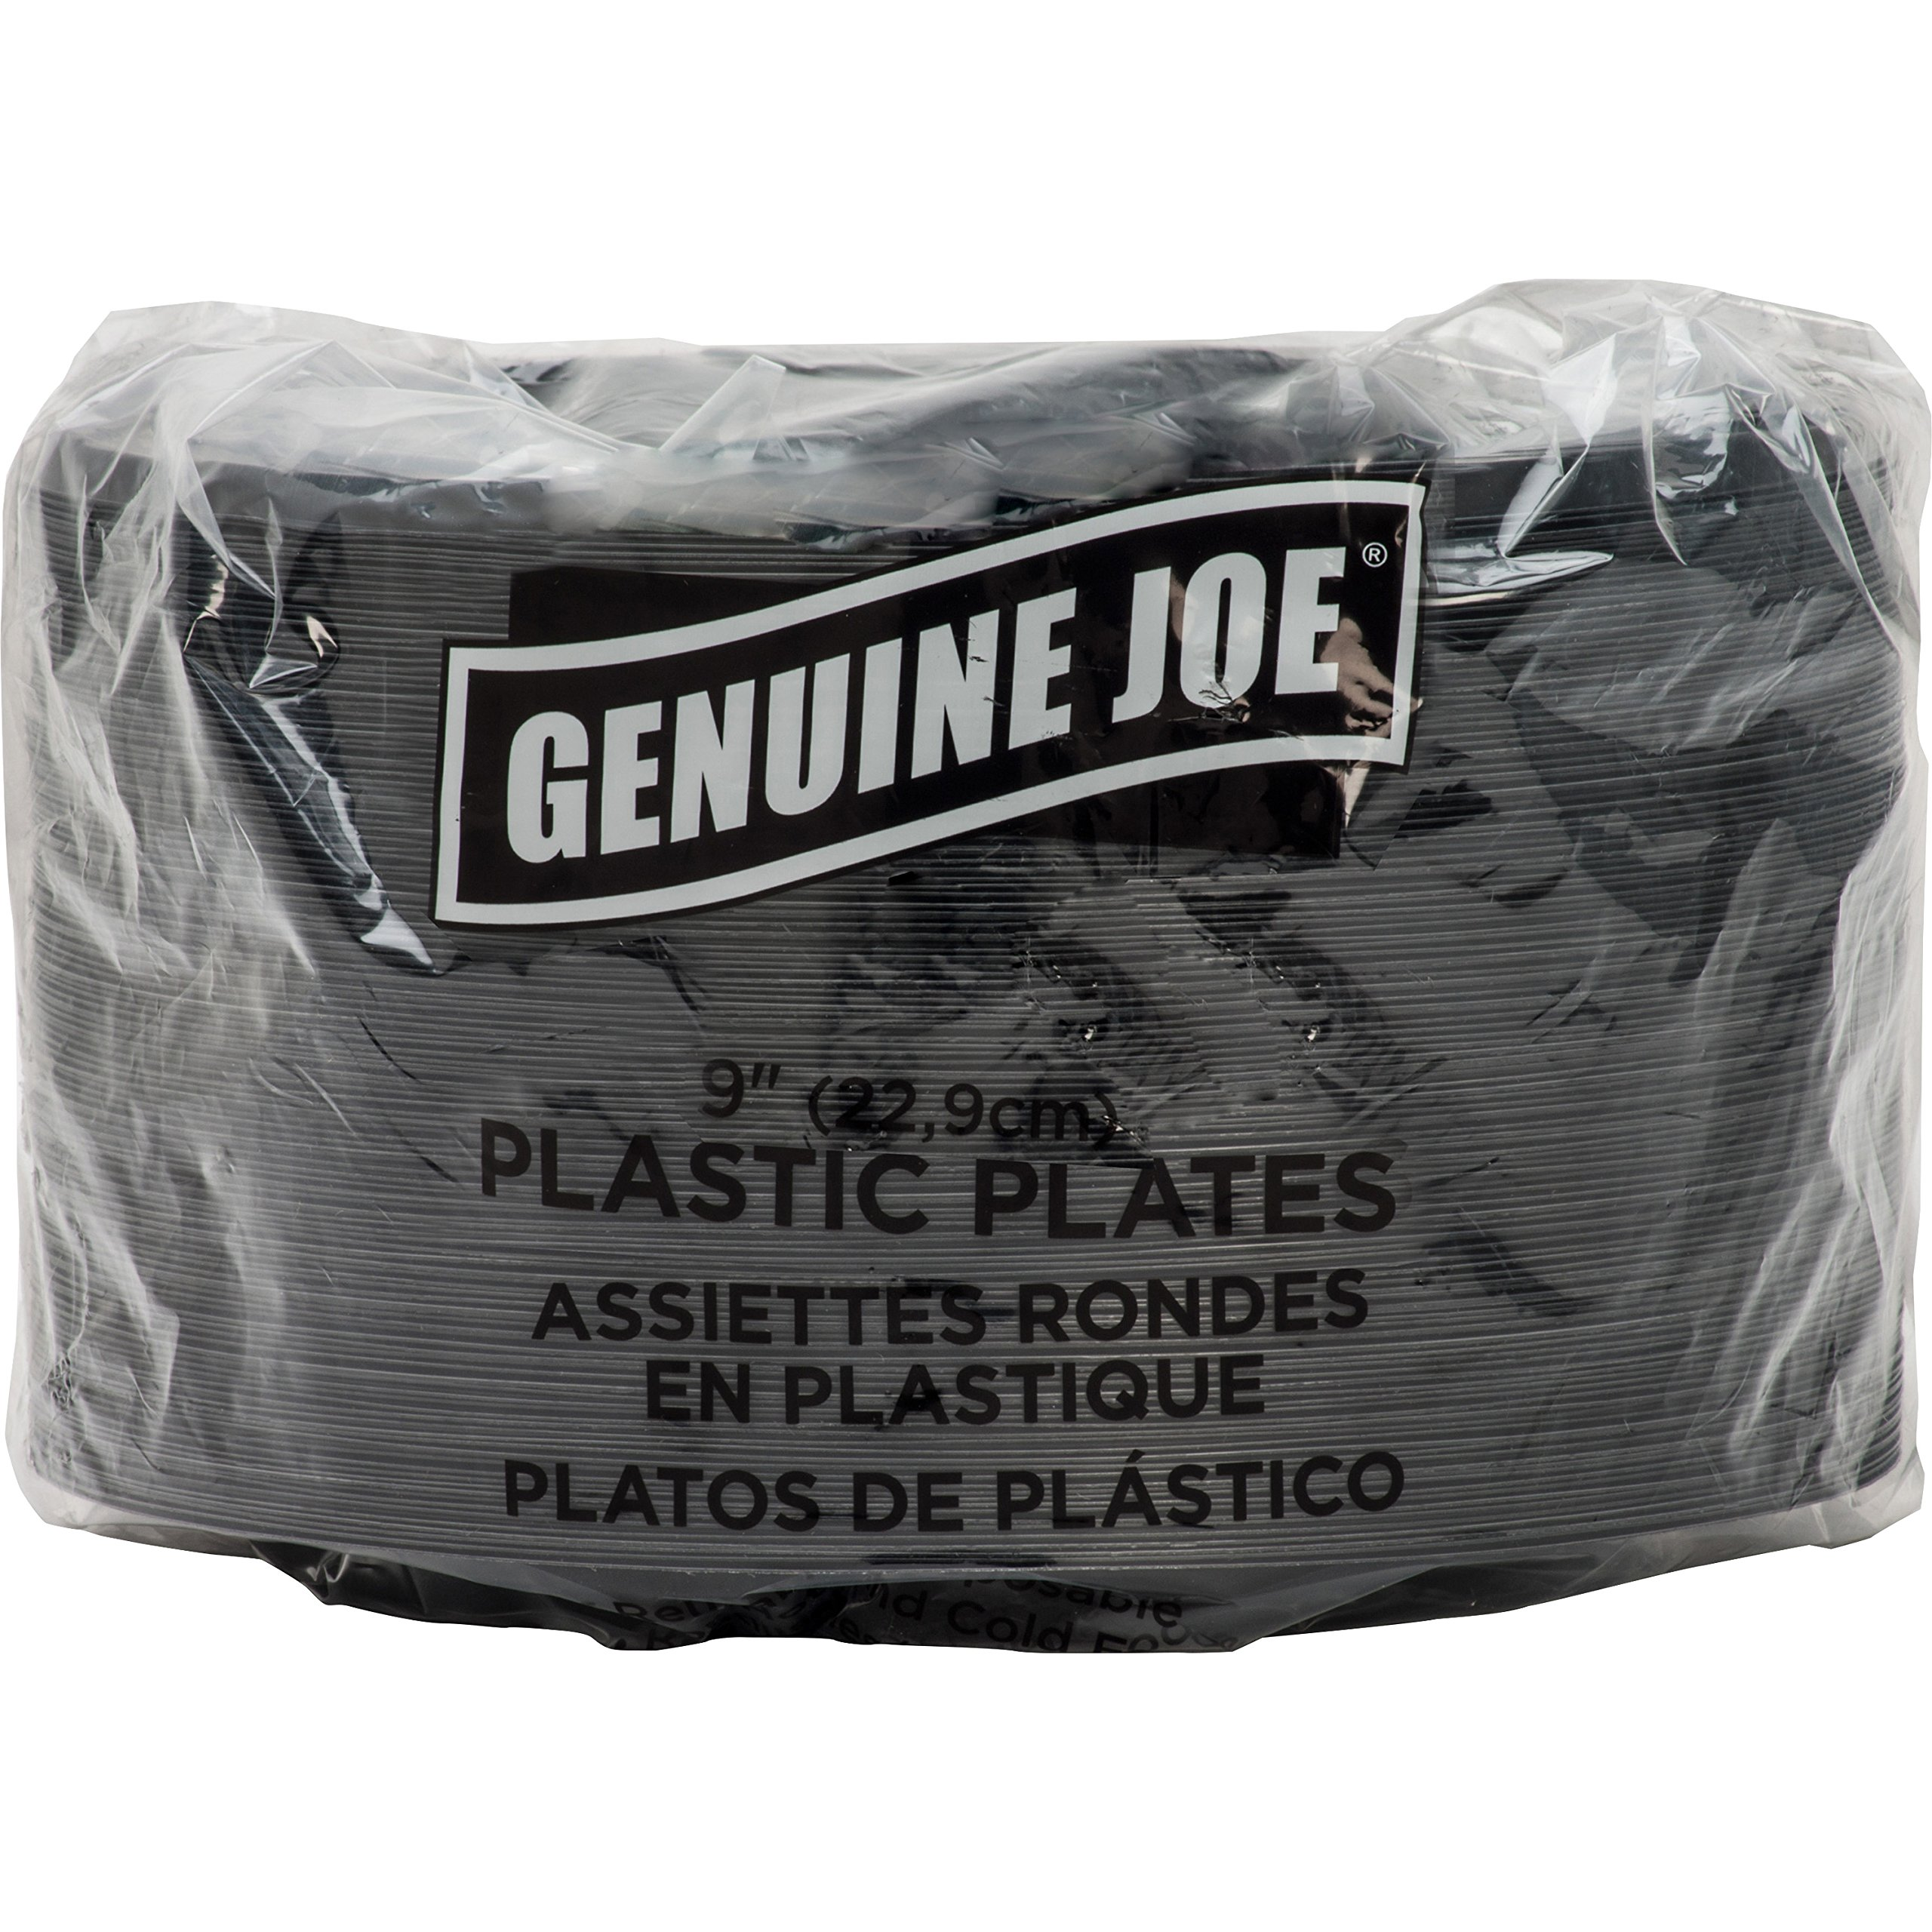 Genuine Joe GJO10429 Plastic Round Plate, 9'' Diameter, Black (Pack of 125)